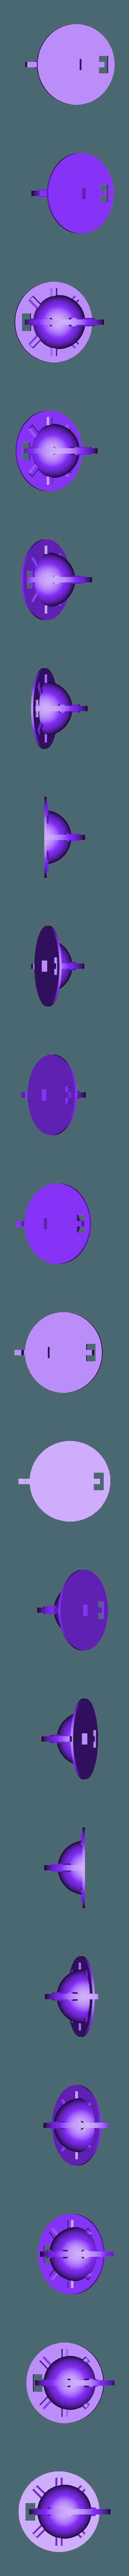 Bottom_Sphere_v2.stl Download free STL file Timeless Life Boat with Spinning Rings • Design to 3D print, Dsk